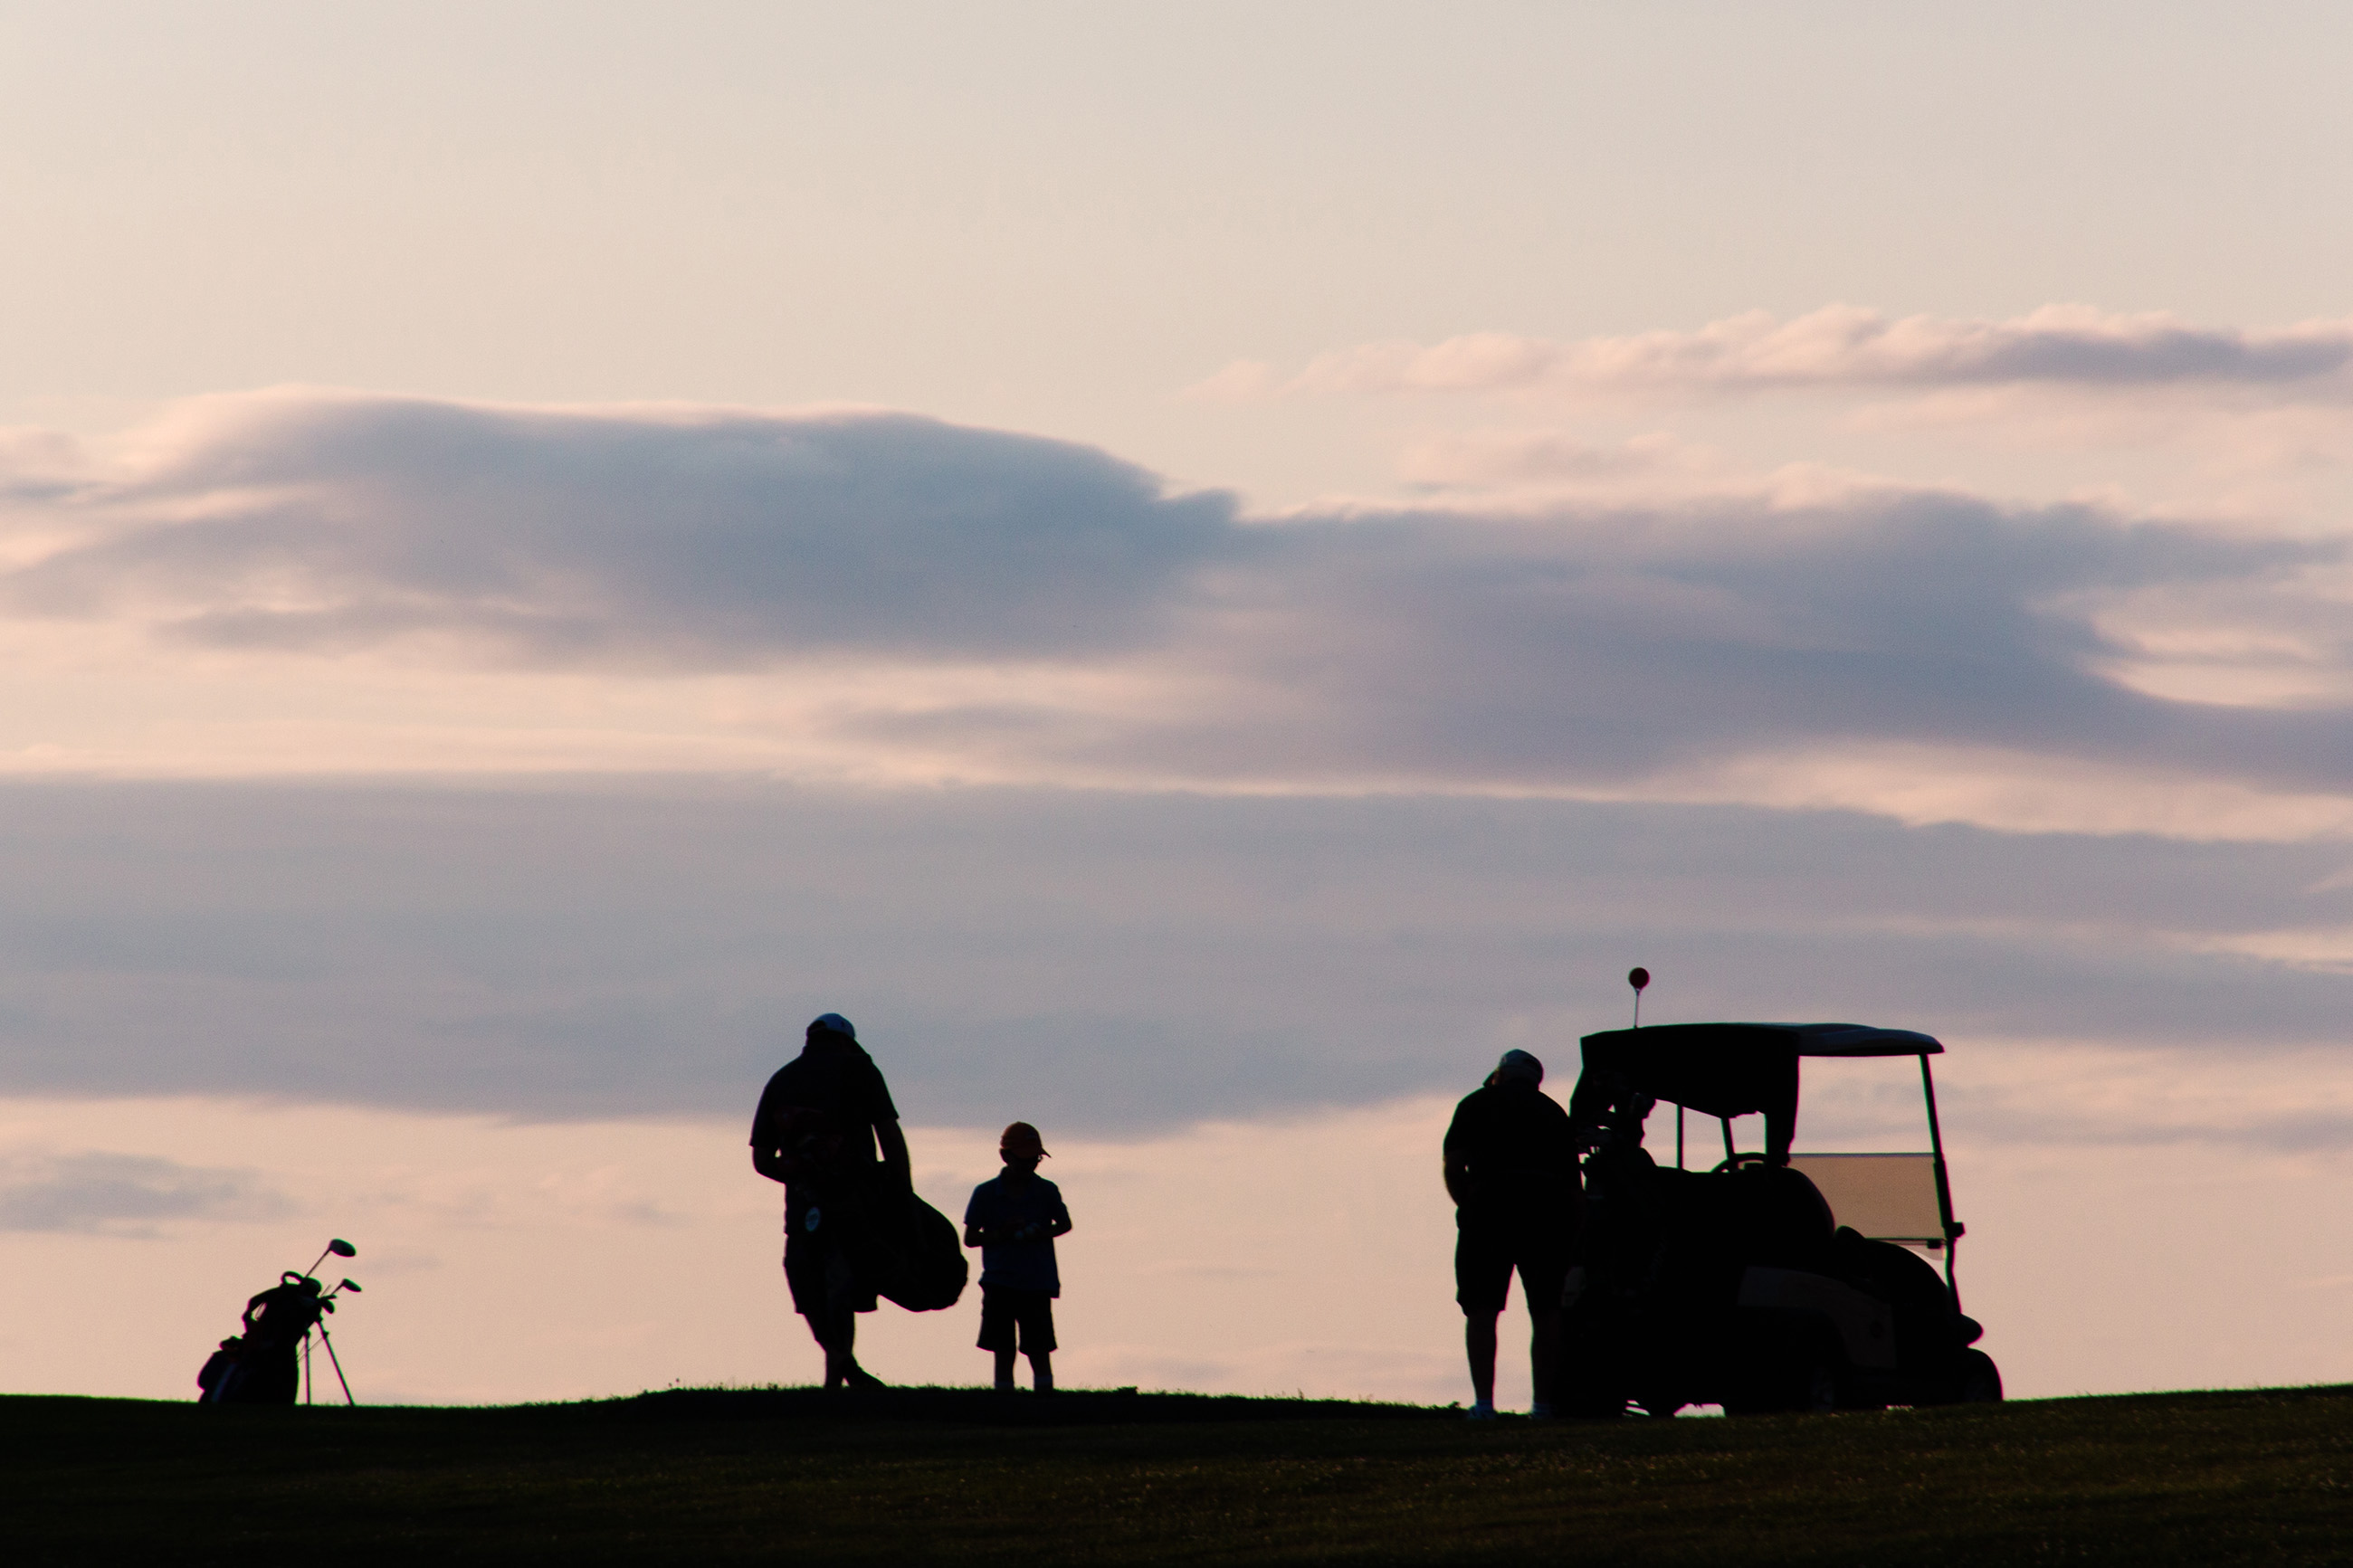 Playing Golf, Activity, Putt, Landscape, Leisure, HQ Photo